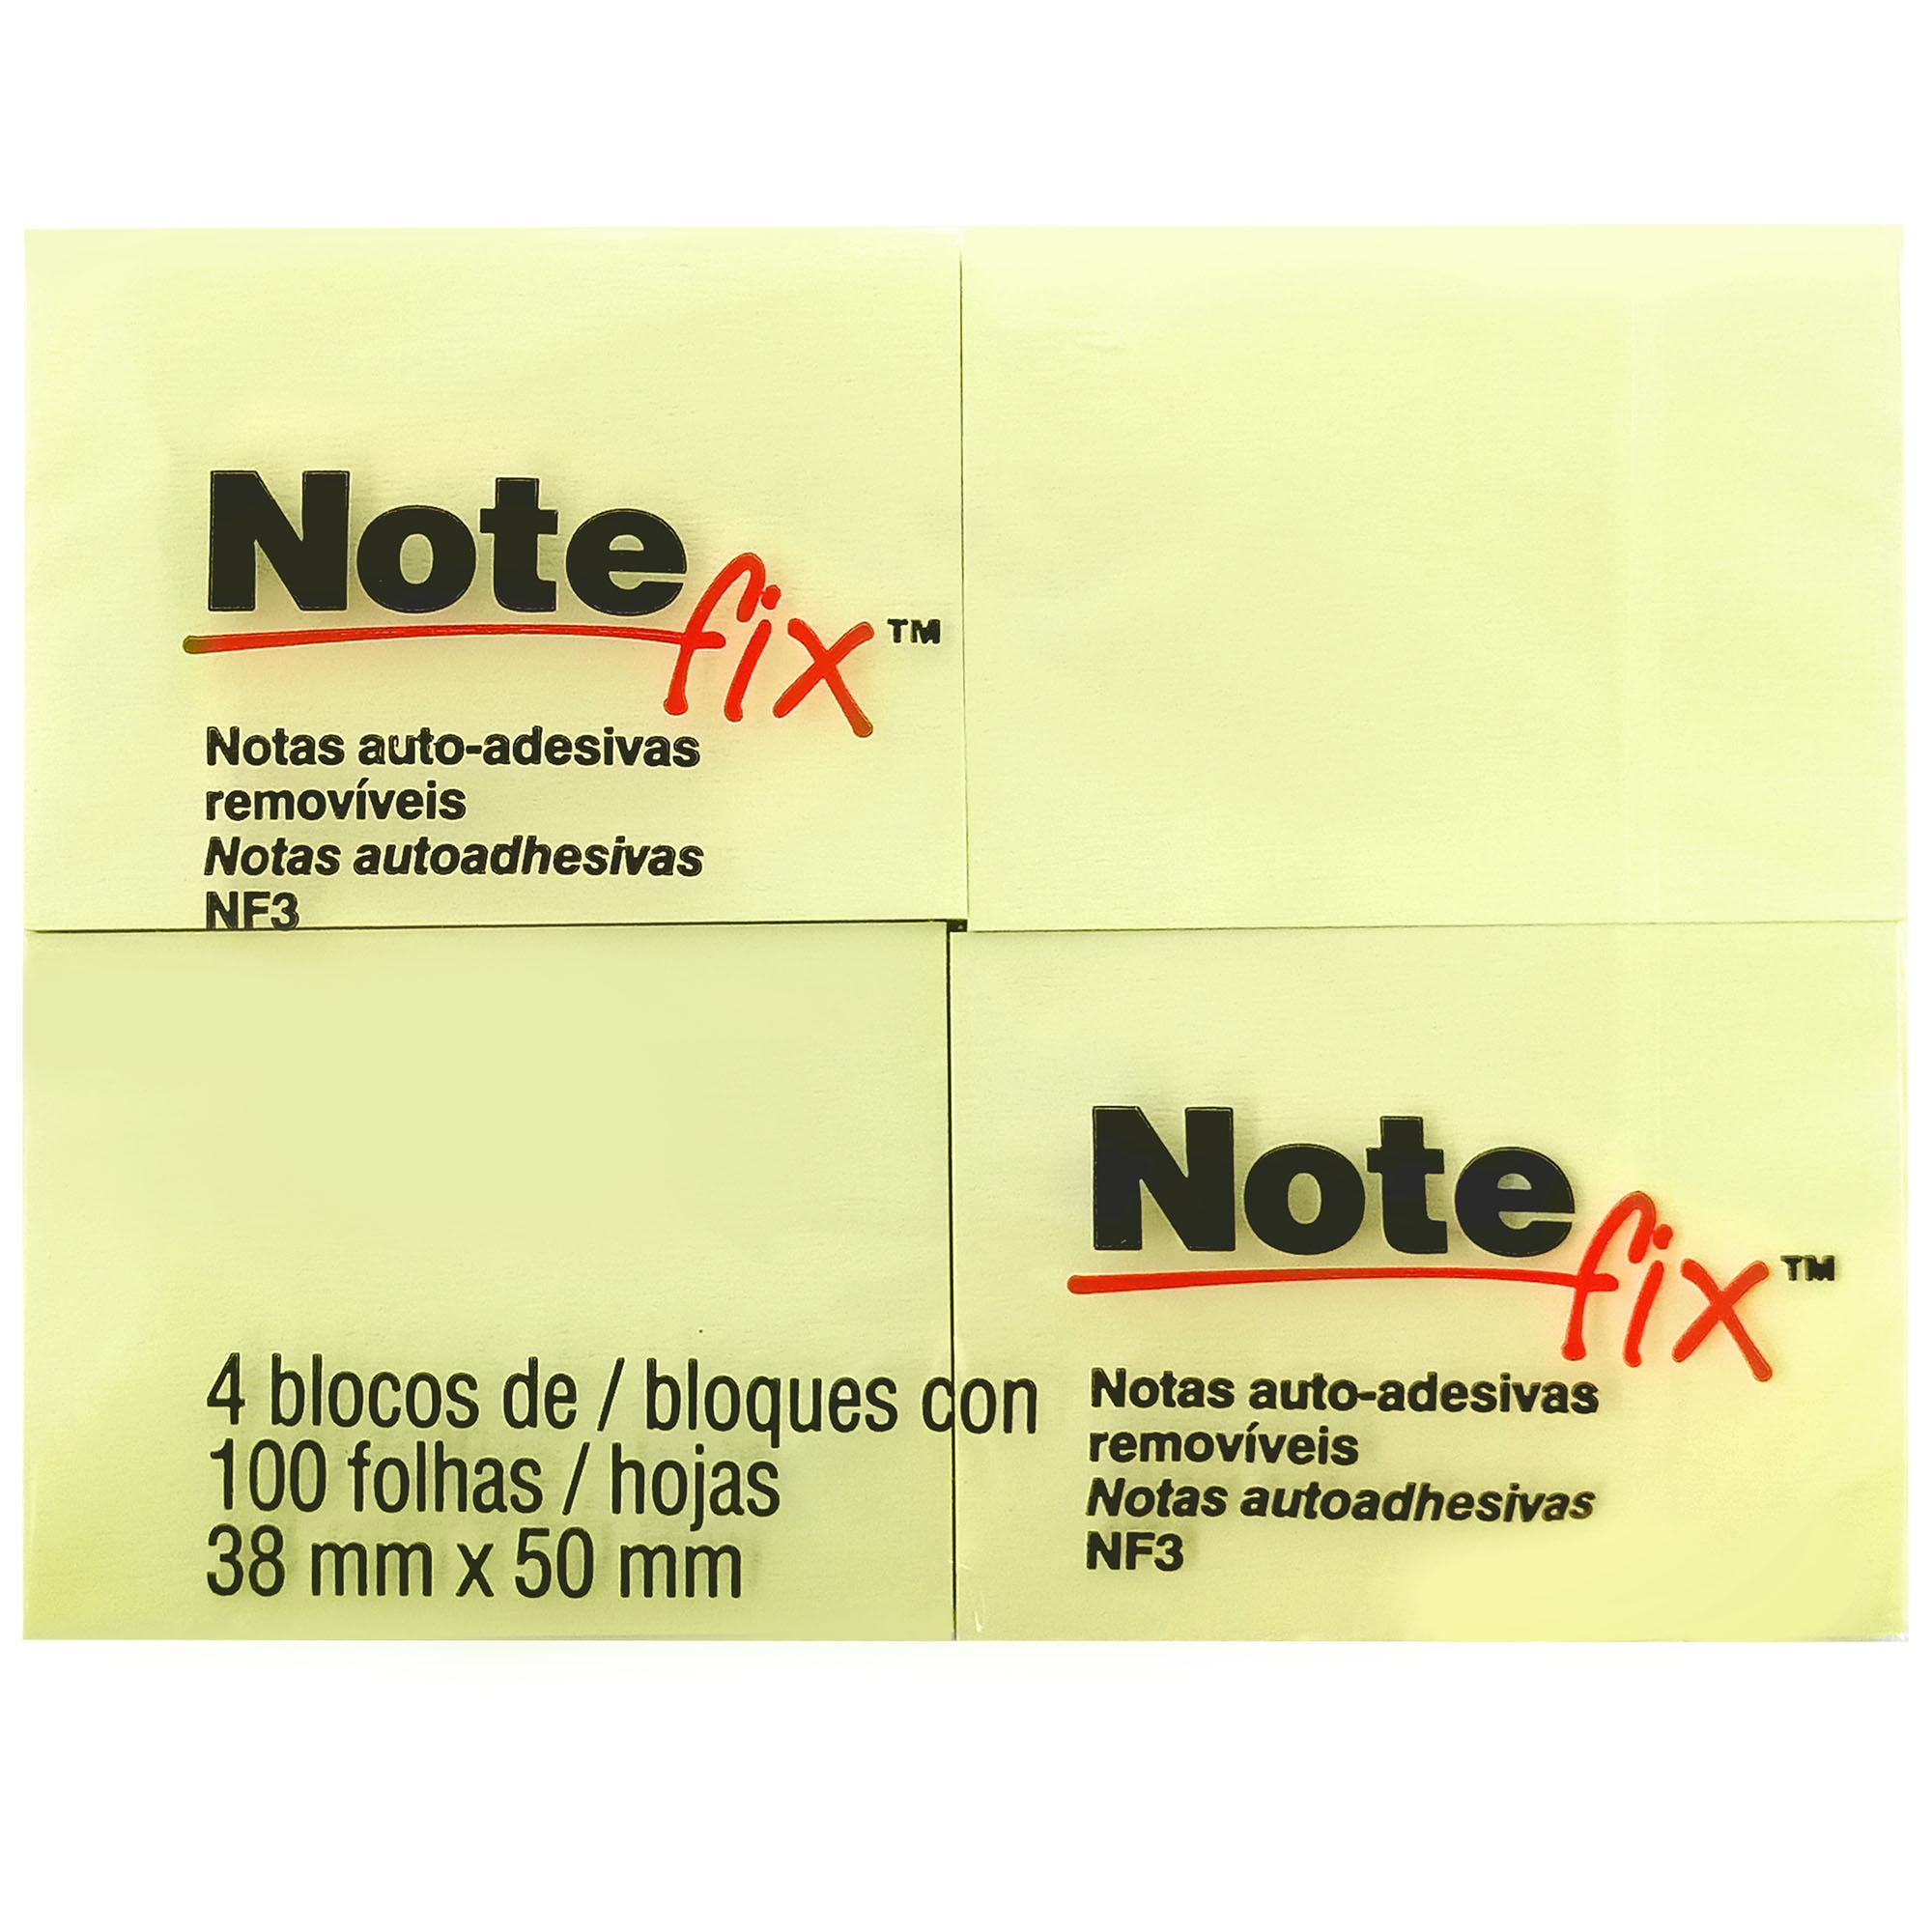 Bloco Autoadesivo Notefix 653 38MMX50MM 100FLS PCT.C/04 HB004088686 - 3M